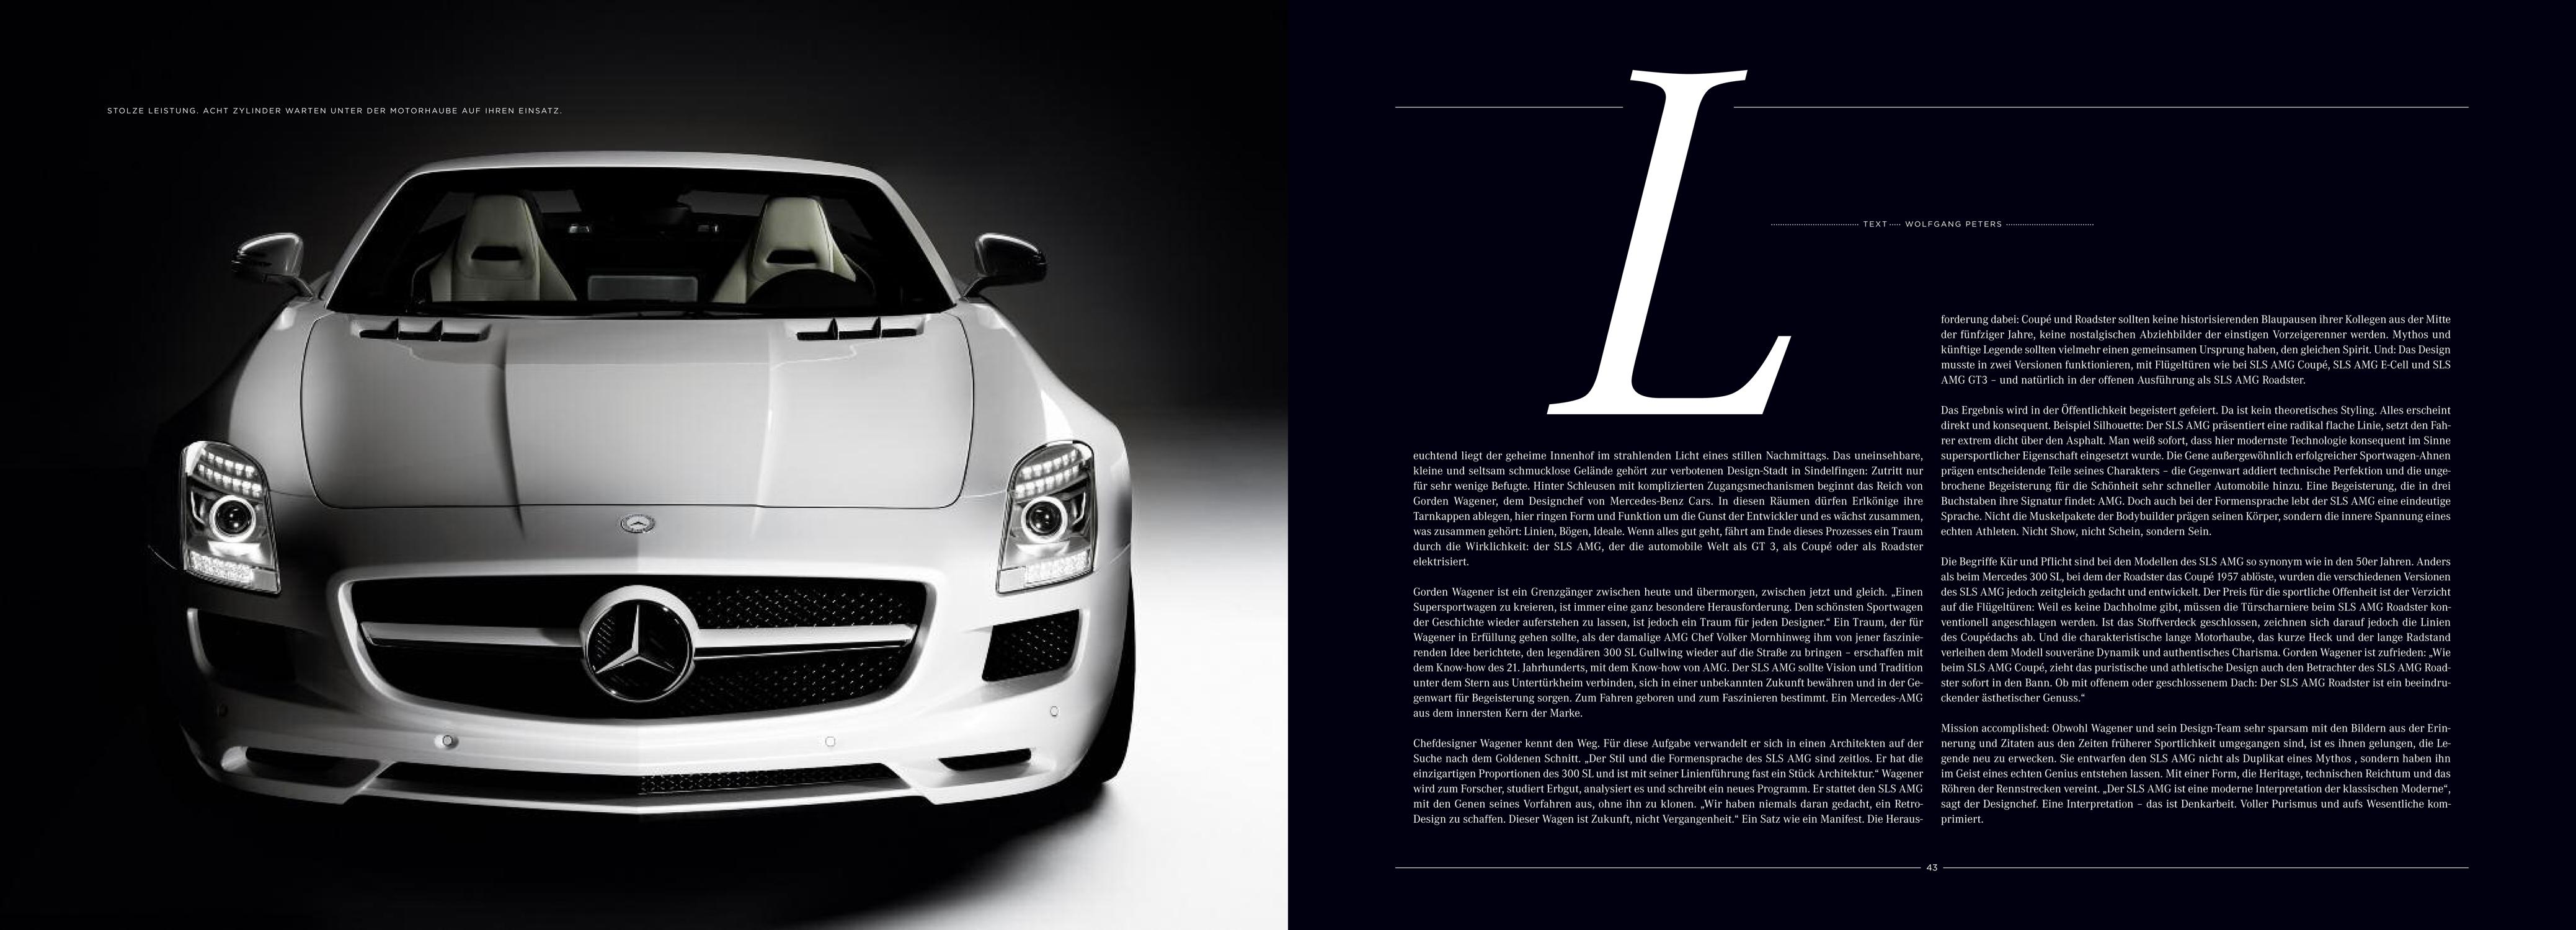 Mercedes-Benz SLS AMG - René Staud | S-League